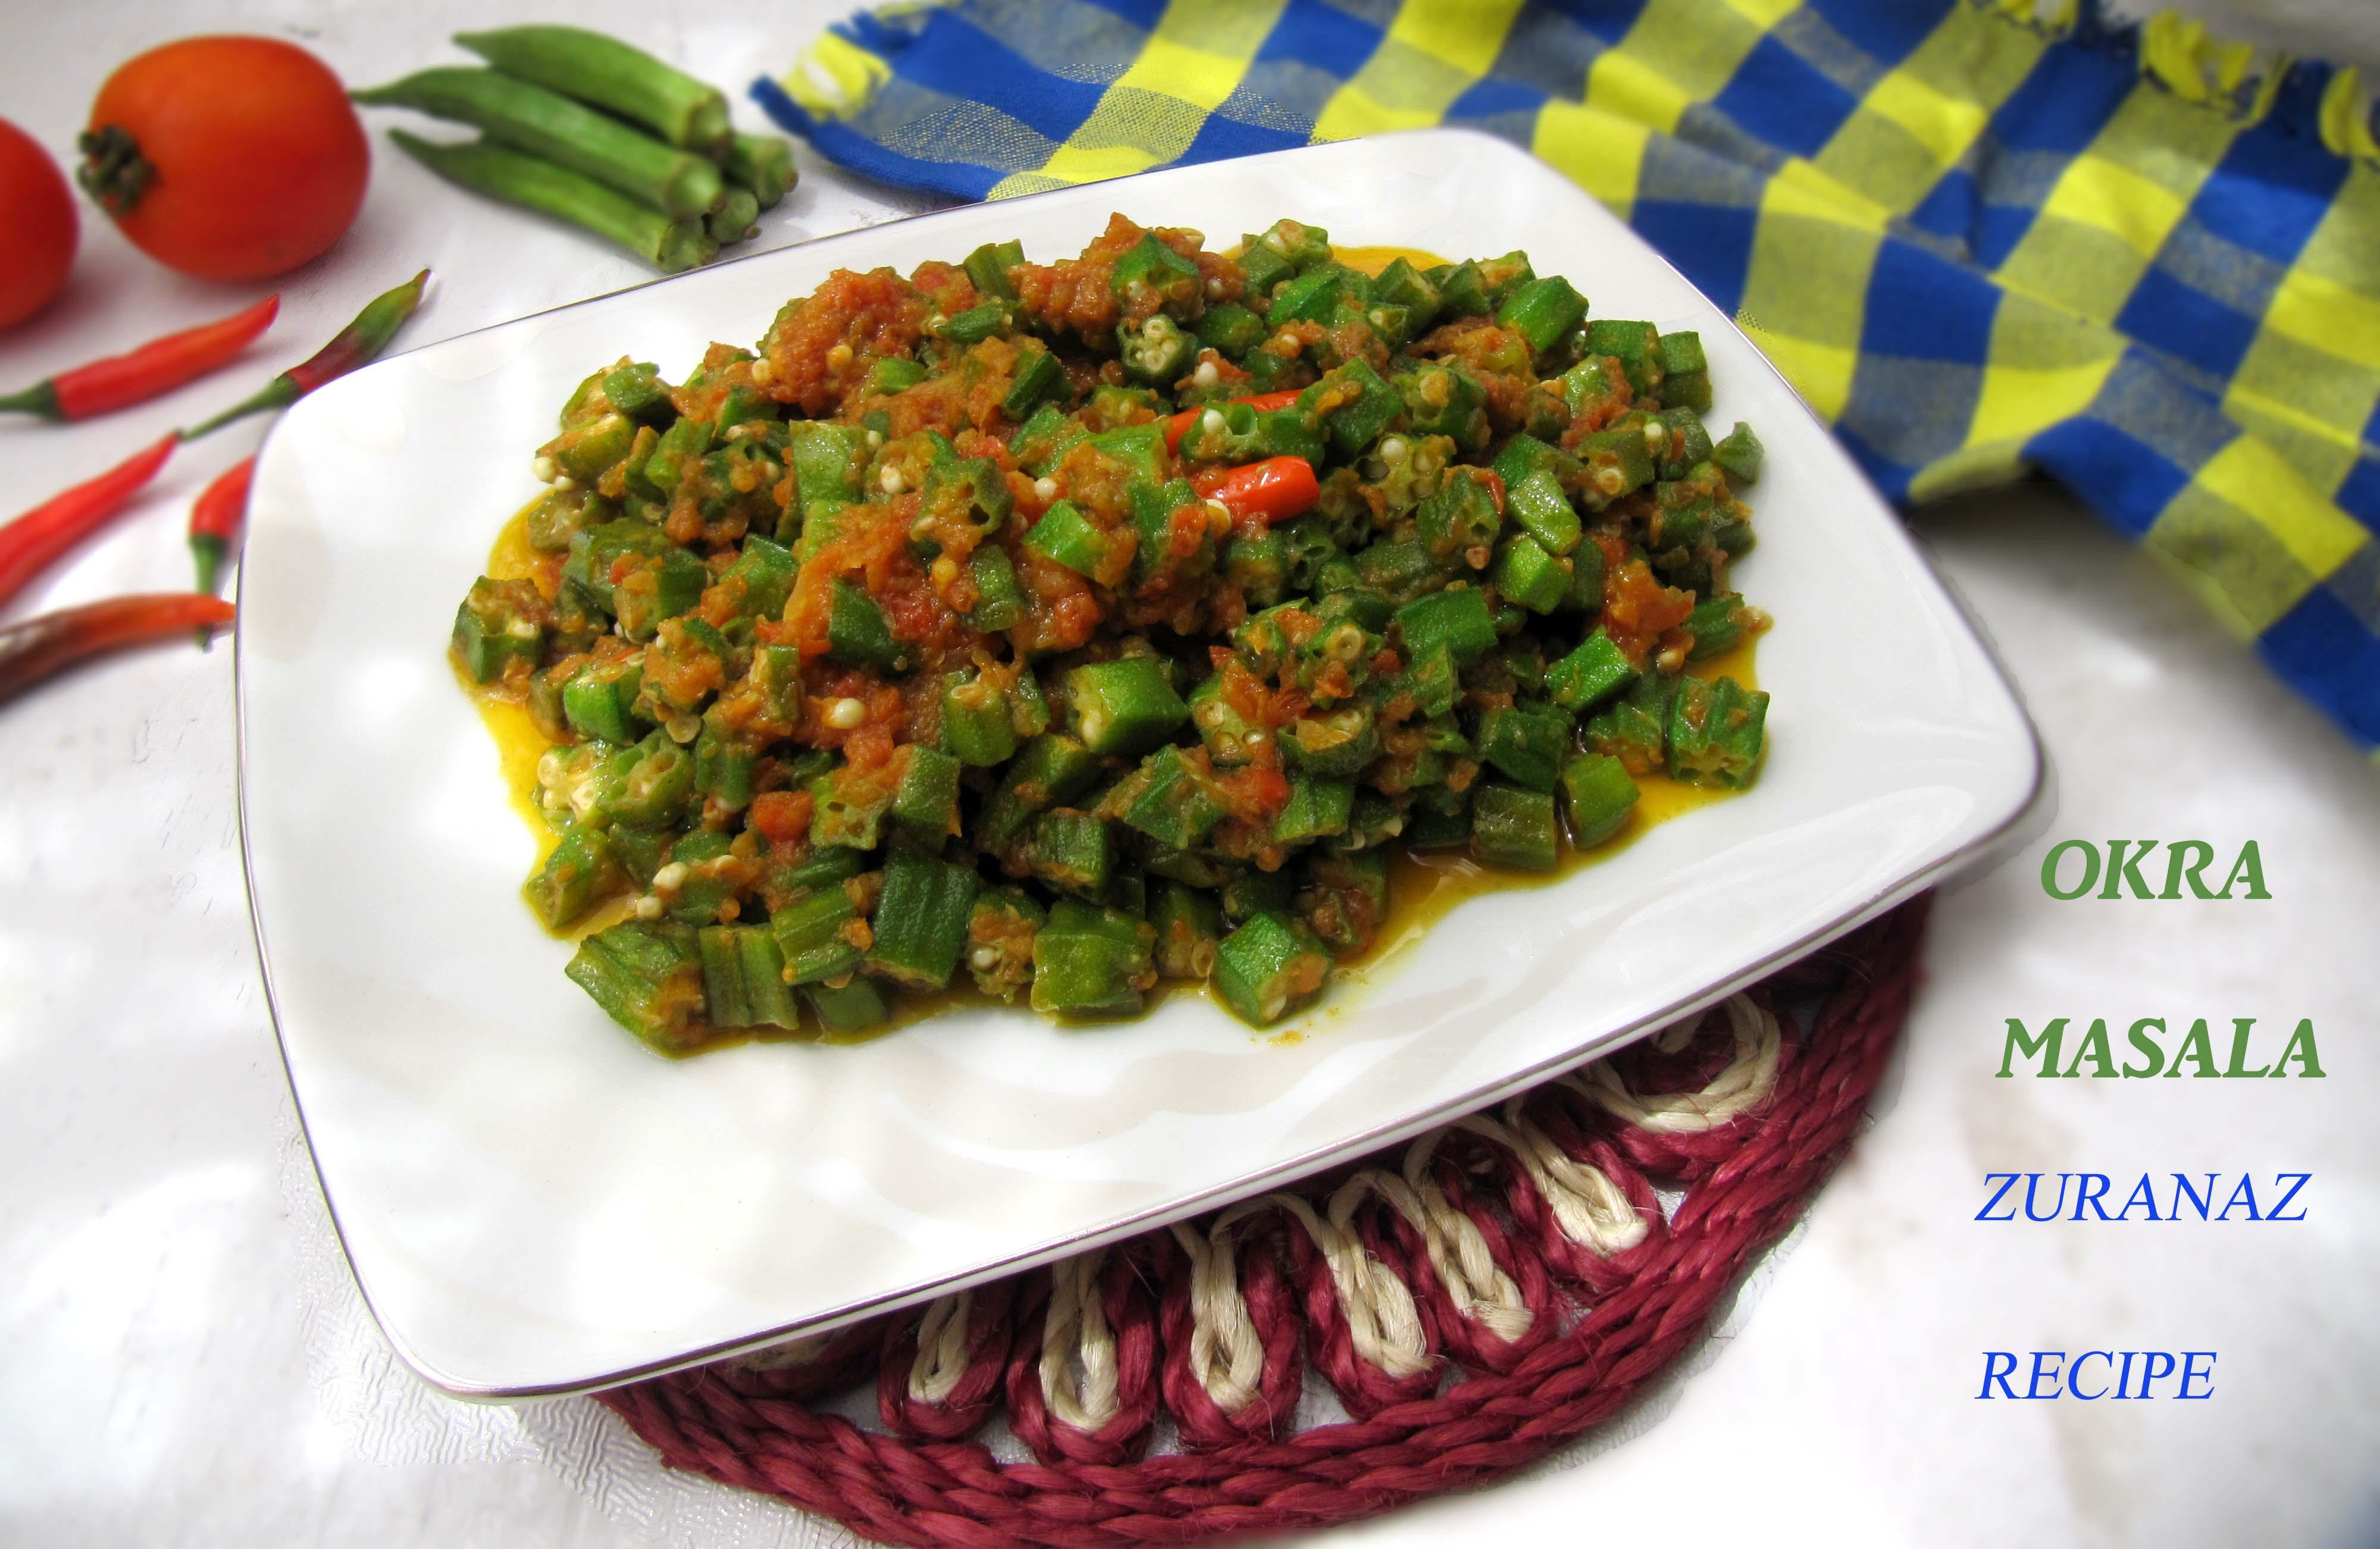 Vegetable recipes page 3 bangla bangladeshi bengali food recipes spicy okrabhendi masaladerosh bhaji forumfinder Image collections